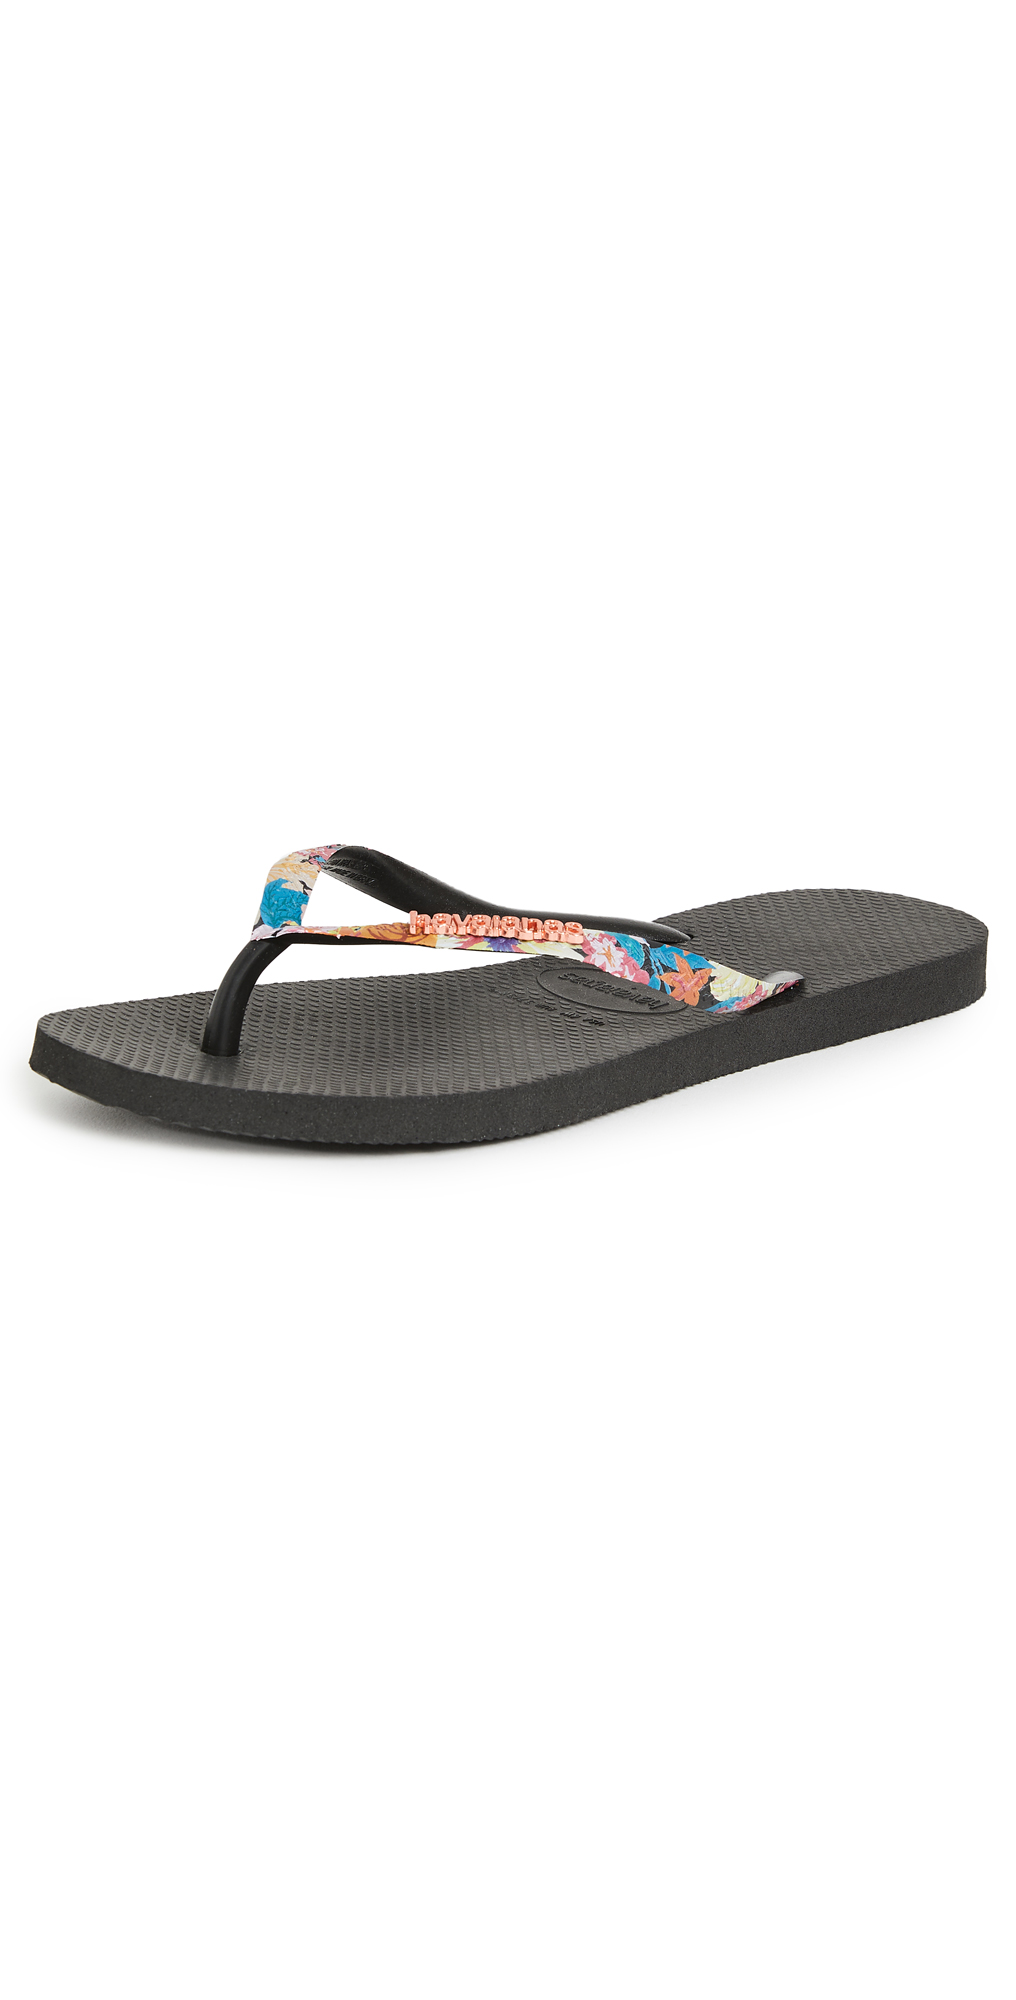 Havaianas Slim Strapped Flip Flops